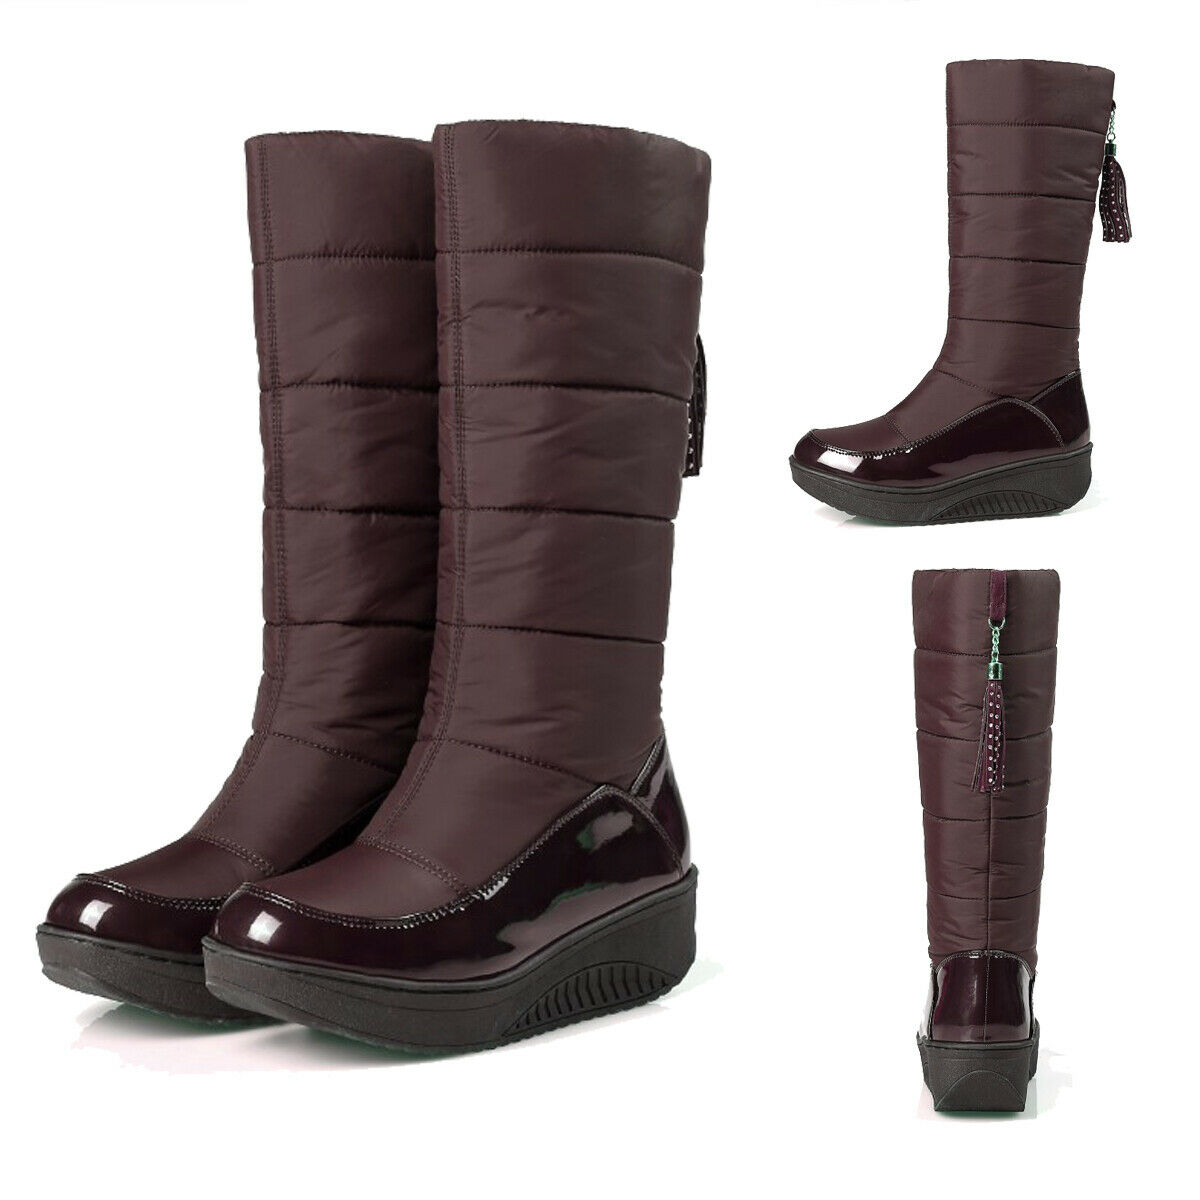 Women Winter Snow Boots Warm Cotton Blend Fur Lined Short Tube Ankle Boots shoes